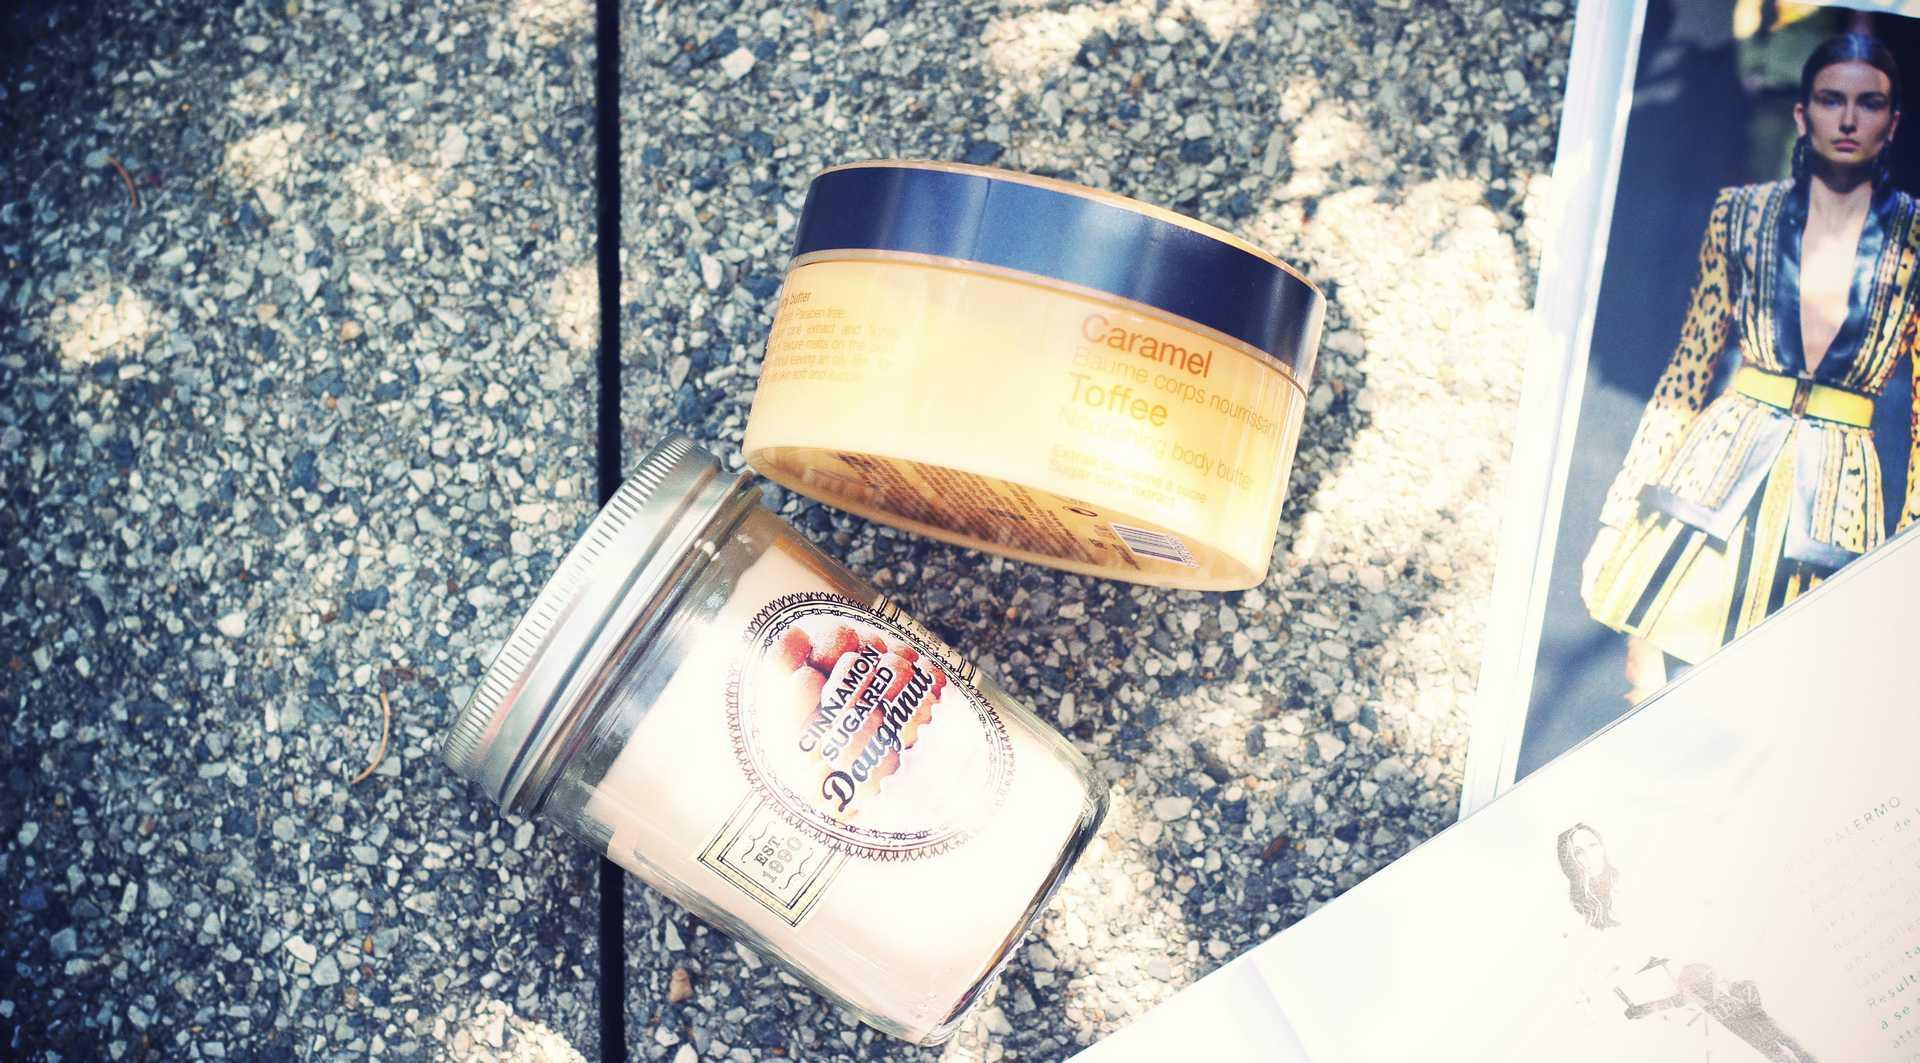 nunaavane-beauty-blogger-july-favorites-summer-makeup-skincare5